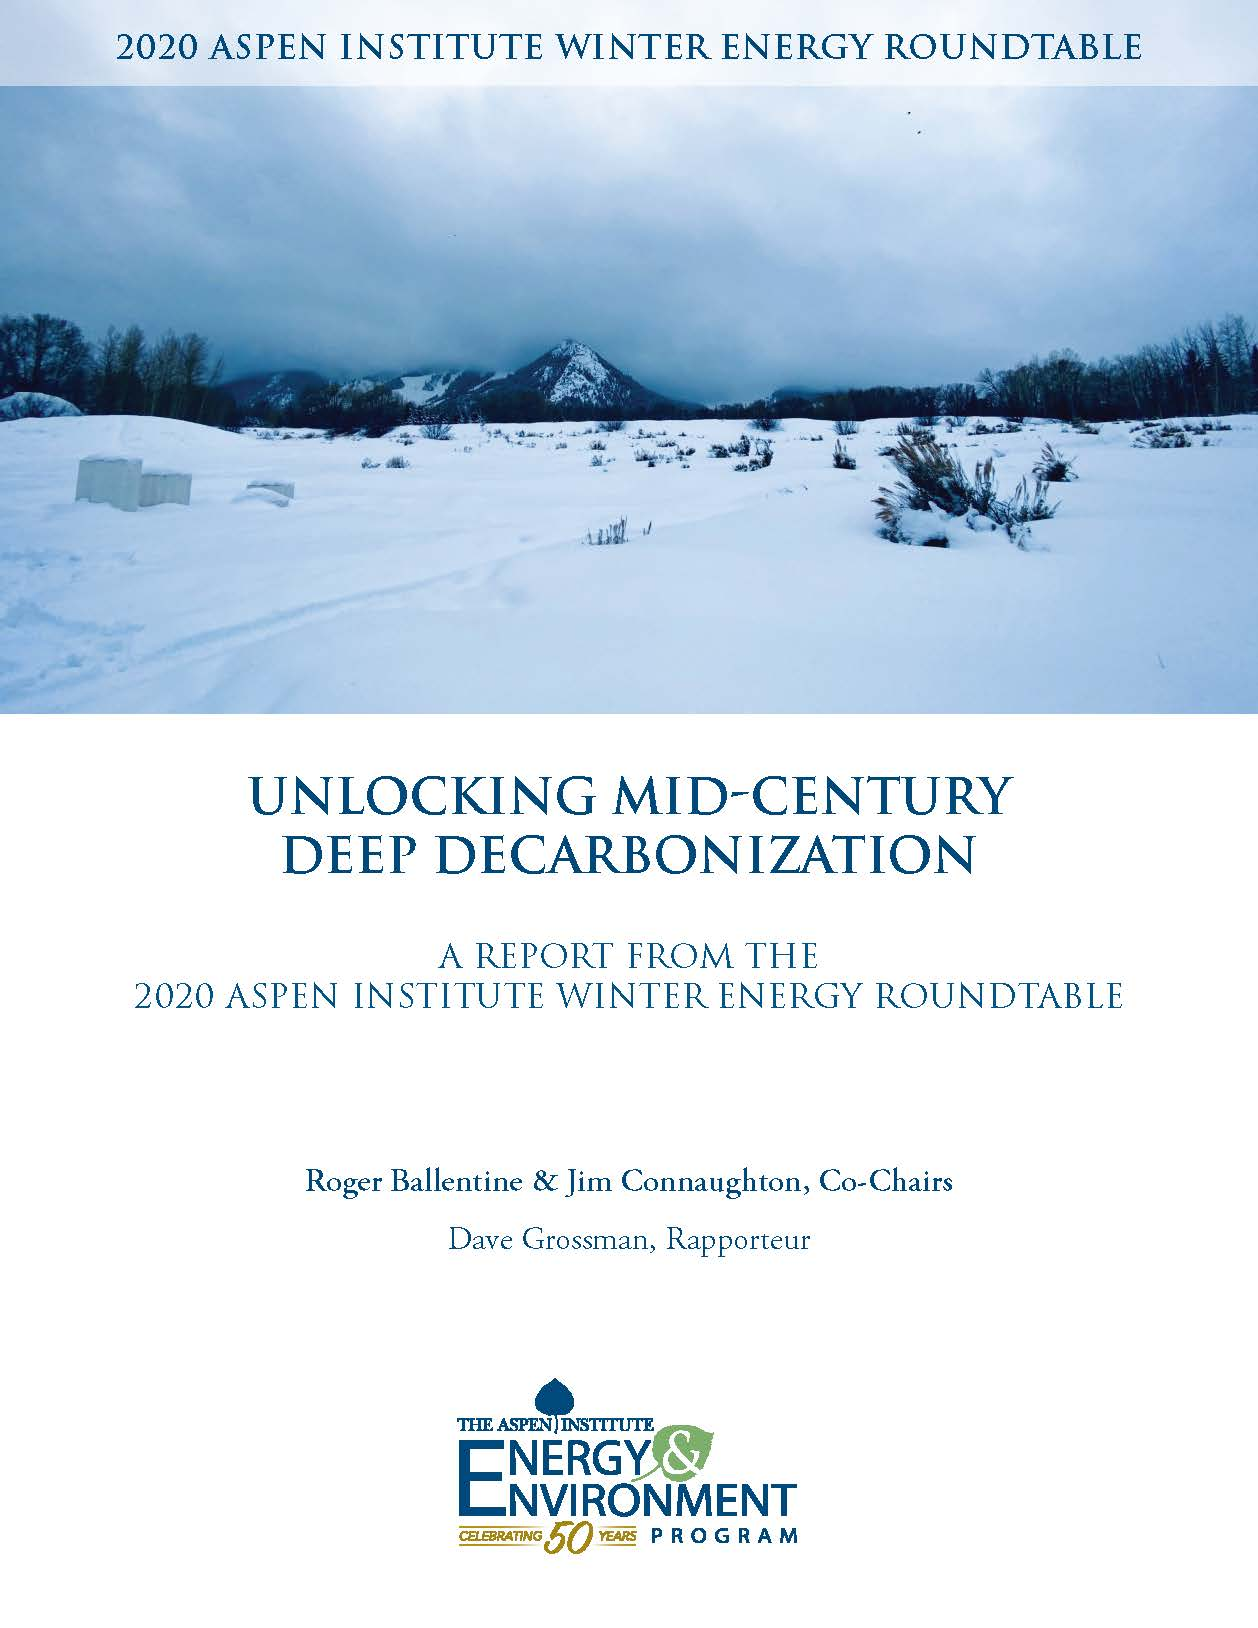 UNLOCKING MID-CENTURY DEEP DECARBONIZATION